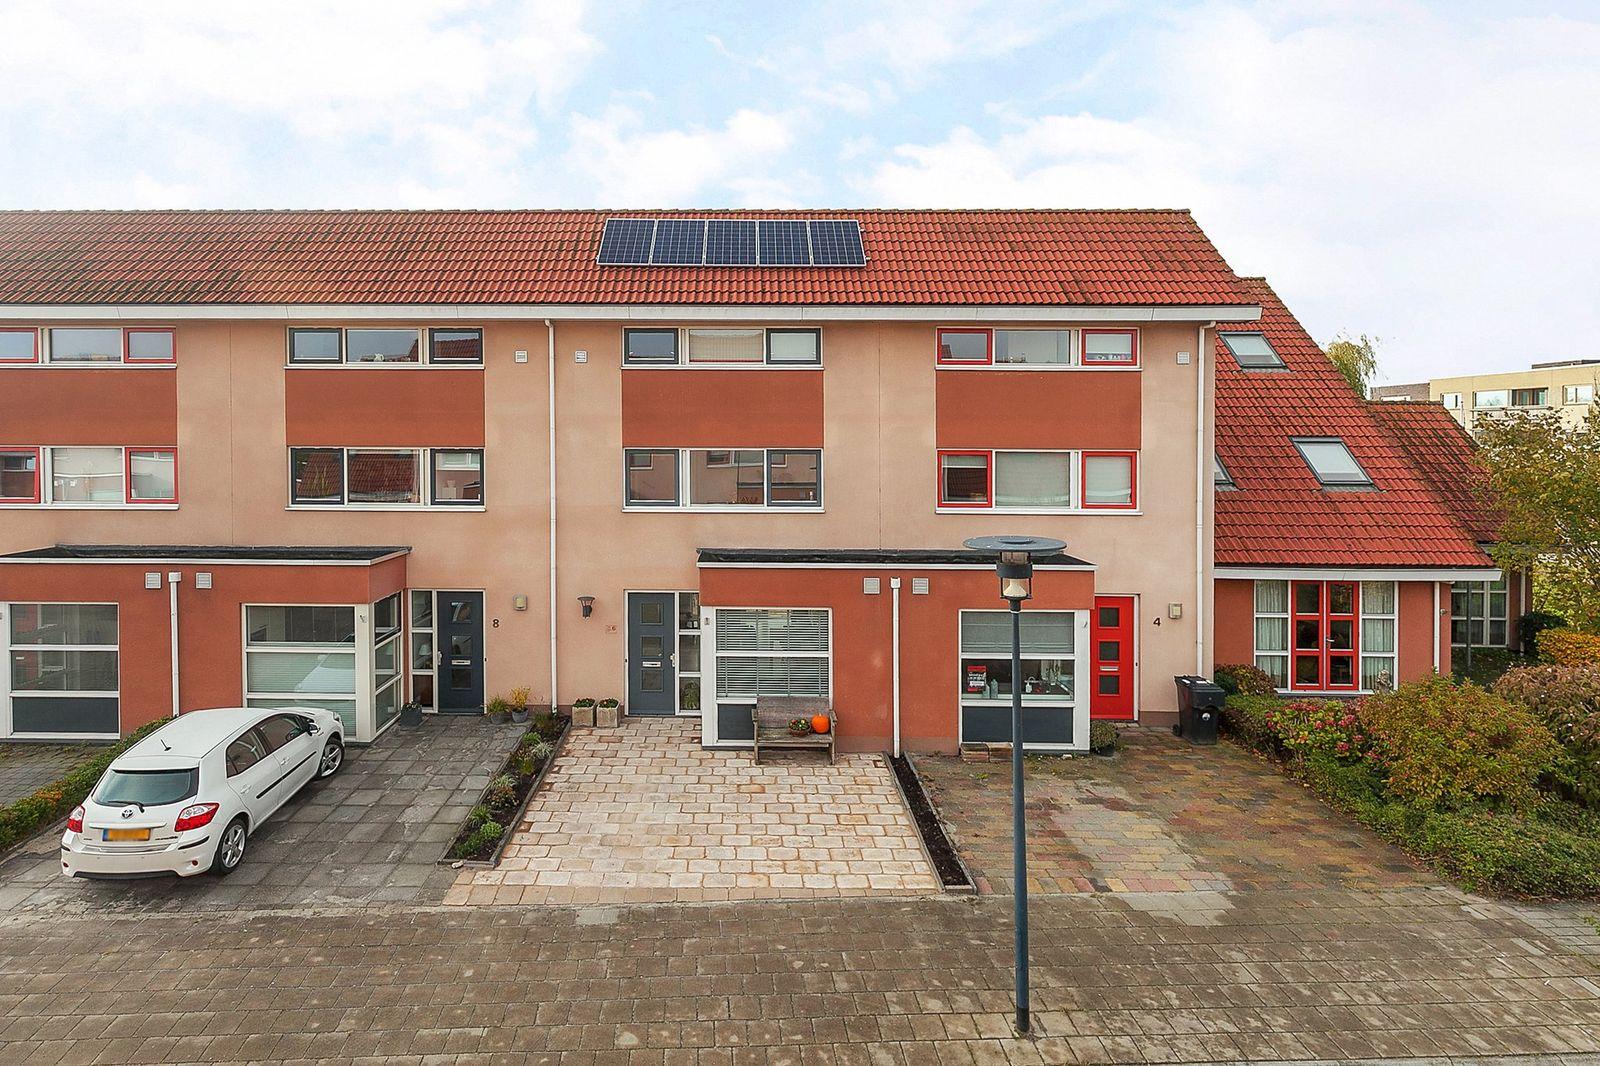 Zijlroede 6, Leeuwarden